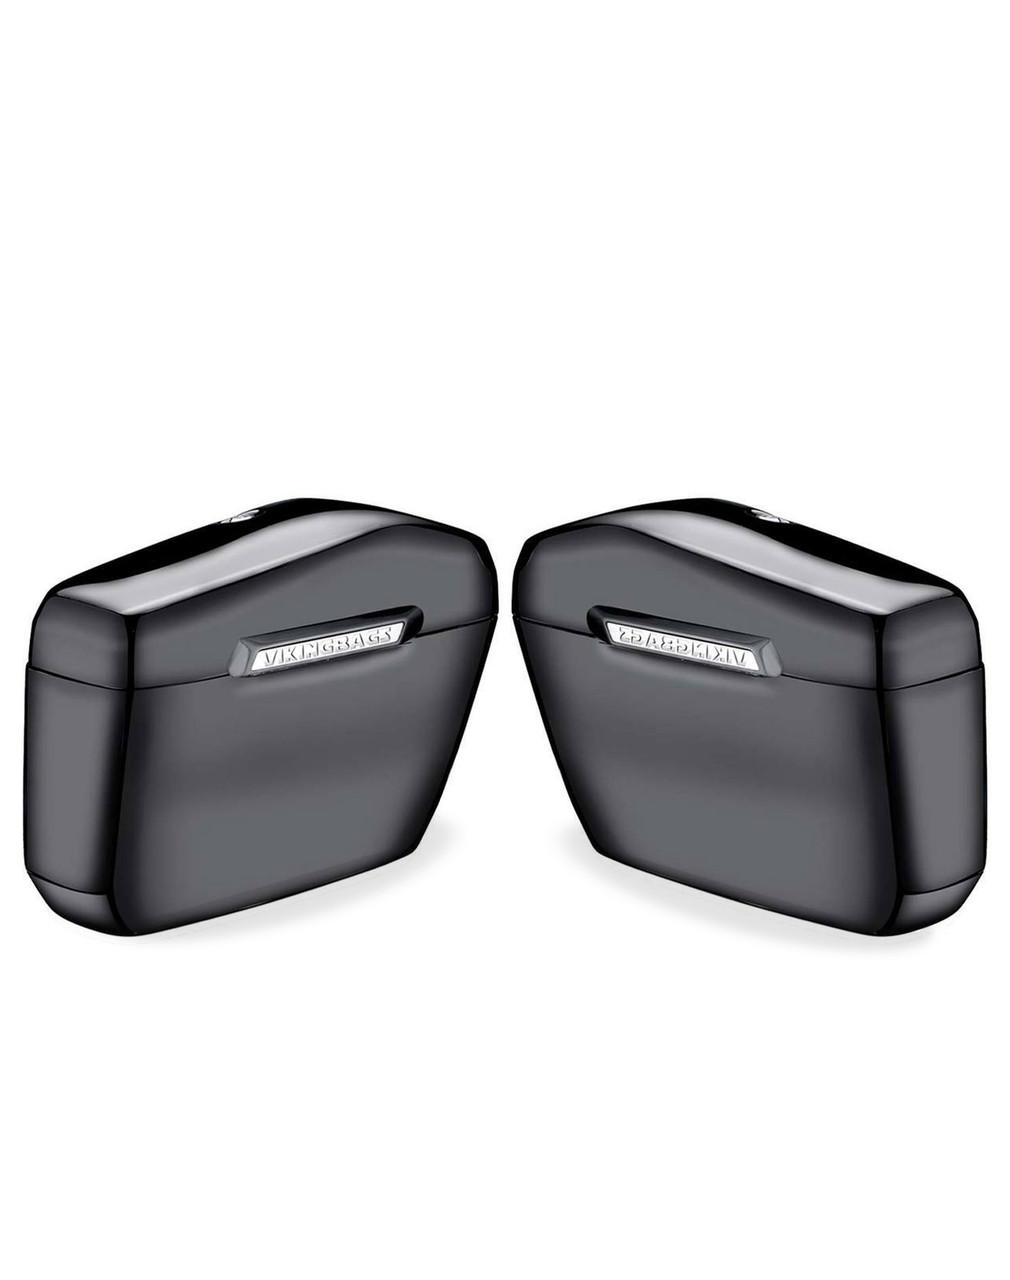 Honda VTX 1800 S Viking Lamellar Large Black Hard Saddlebags both bags view